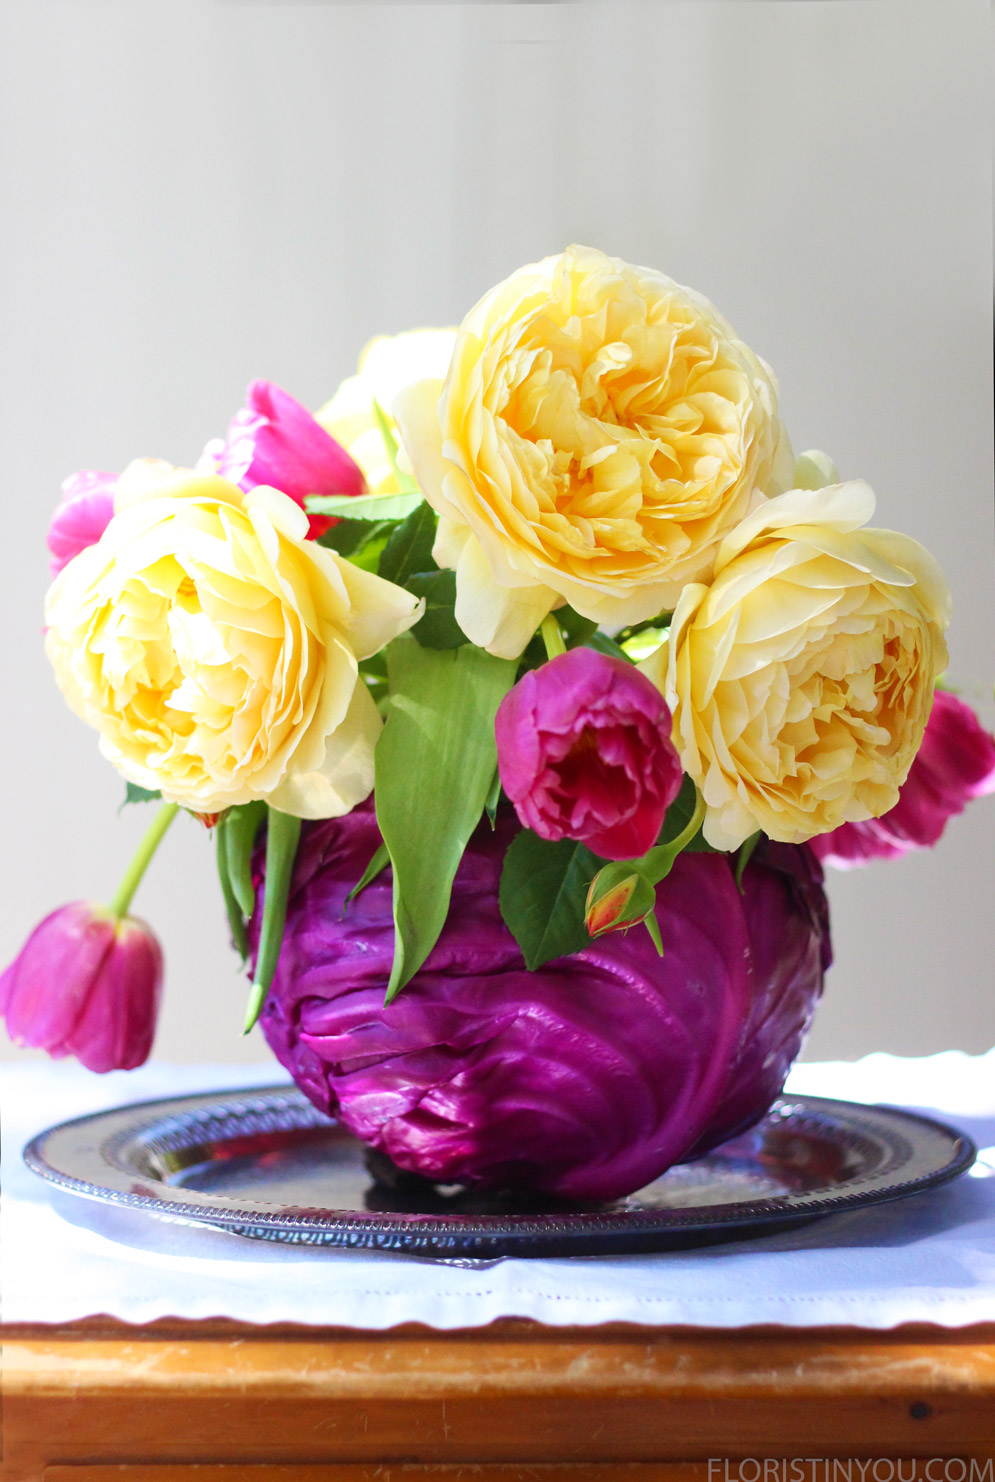 "A Vase You Can Eat                     Normal   0           false   false   false     EN-US   JA   X-NONE                                                                                                                                                                                                                                                                                                                                                                              /* Style Definitions */ table.MsoNormalTable {mso-style-name:""Table Normal""; mso-tstyle-rowband-size:0; mso-tstyle-colband-size:0; mso-style-noshow:yes; mso-style-priority:99; mso-style-parent:""""; mso-padding-alt:0in 5.4pt 0in 5.4pt; mso-para-margin:0in; mso-para-margin-bottom:.0001pt; mso-pagination:widow-orphan; font-size:12.0pt; font-family:Cambria; mso-ascii-font-family:Cambria; mso-ascii-theme-font:minor-latin; mso-hansi-font-family:Cambria; mso-hansi-theme-font:minor-latin;}"